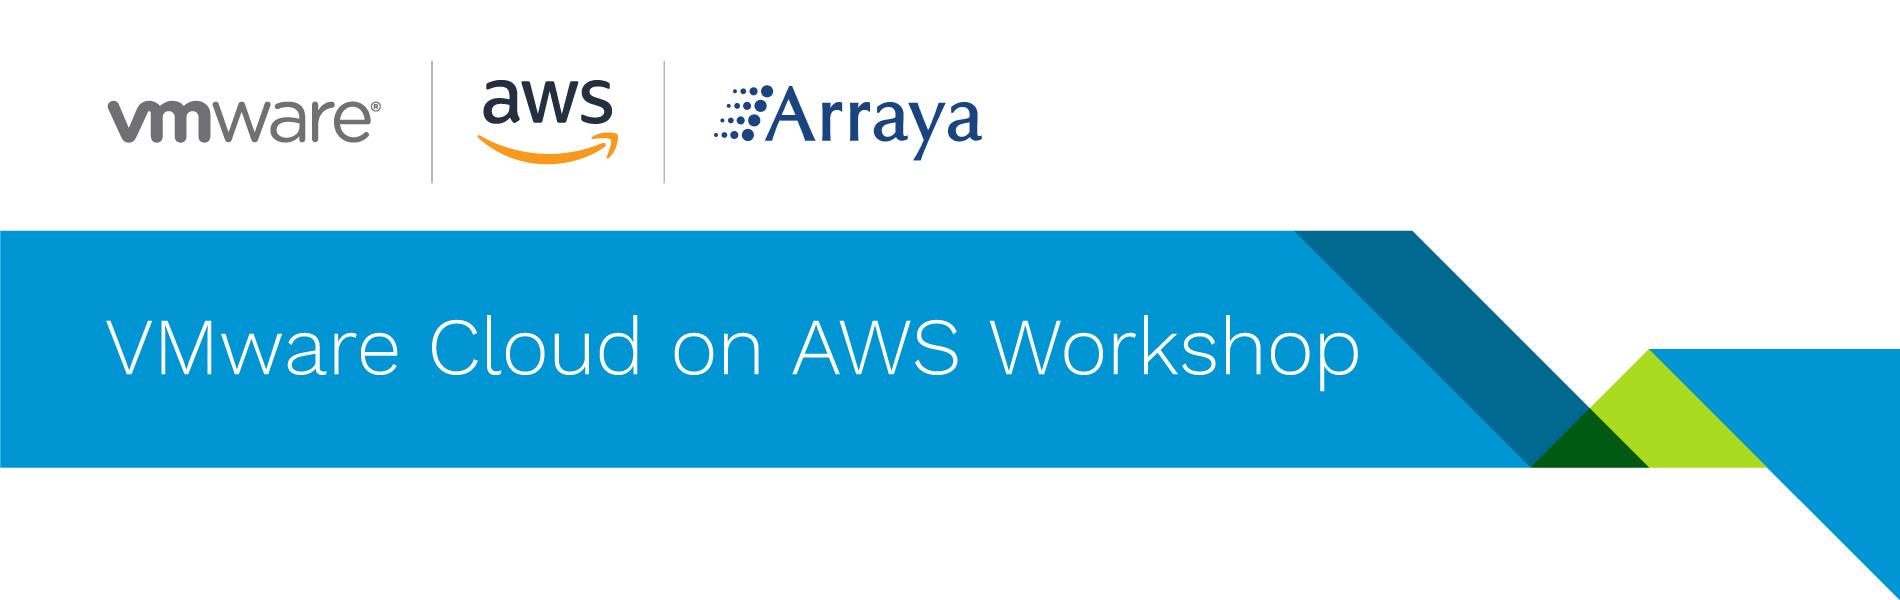 VMware Cloud on AWS - Arraya Solutions